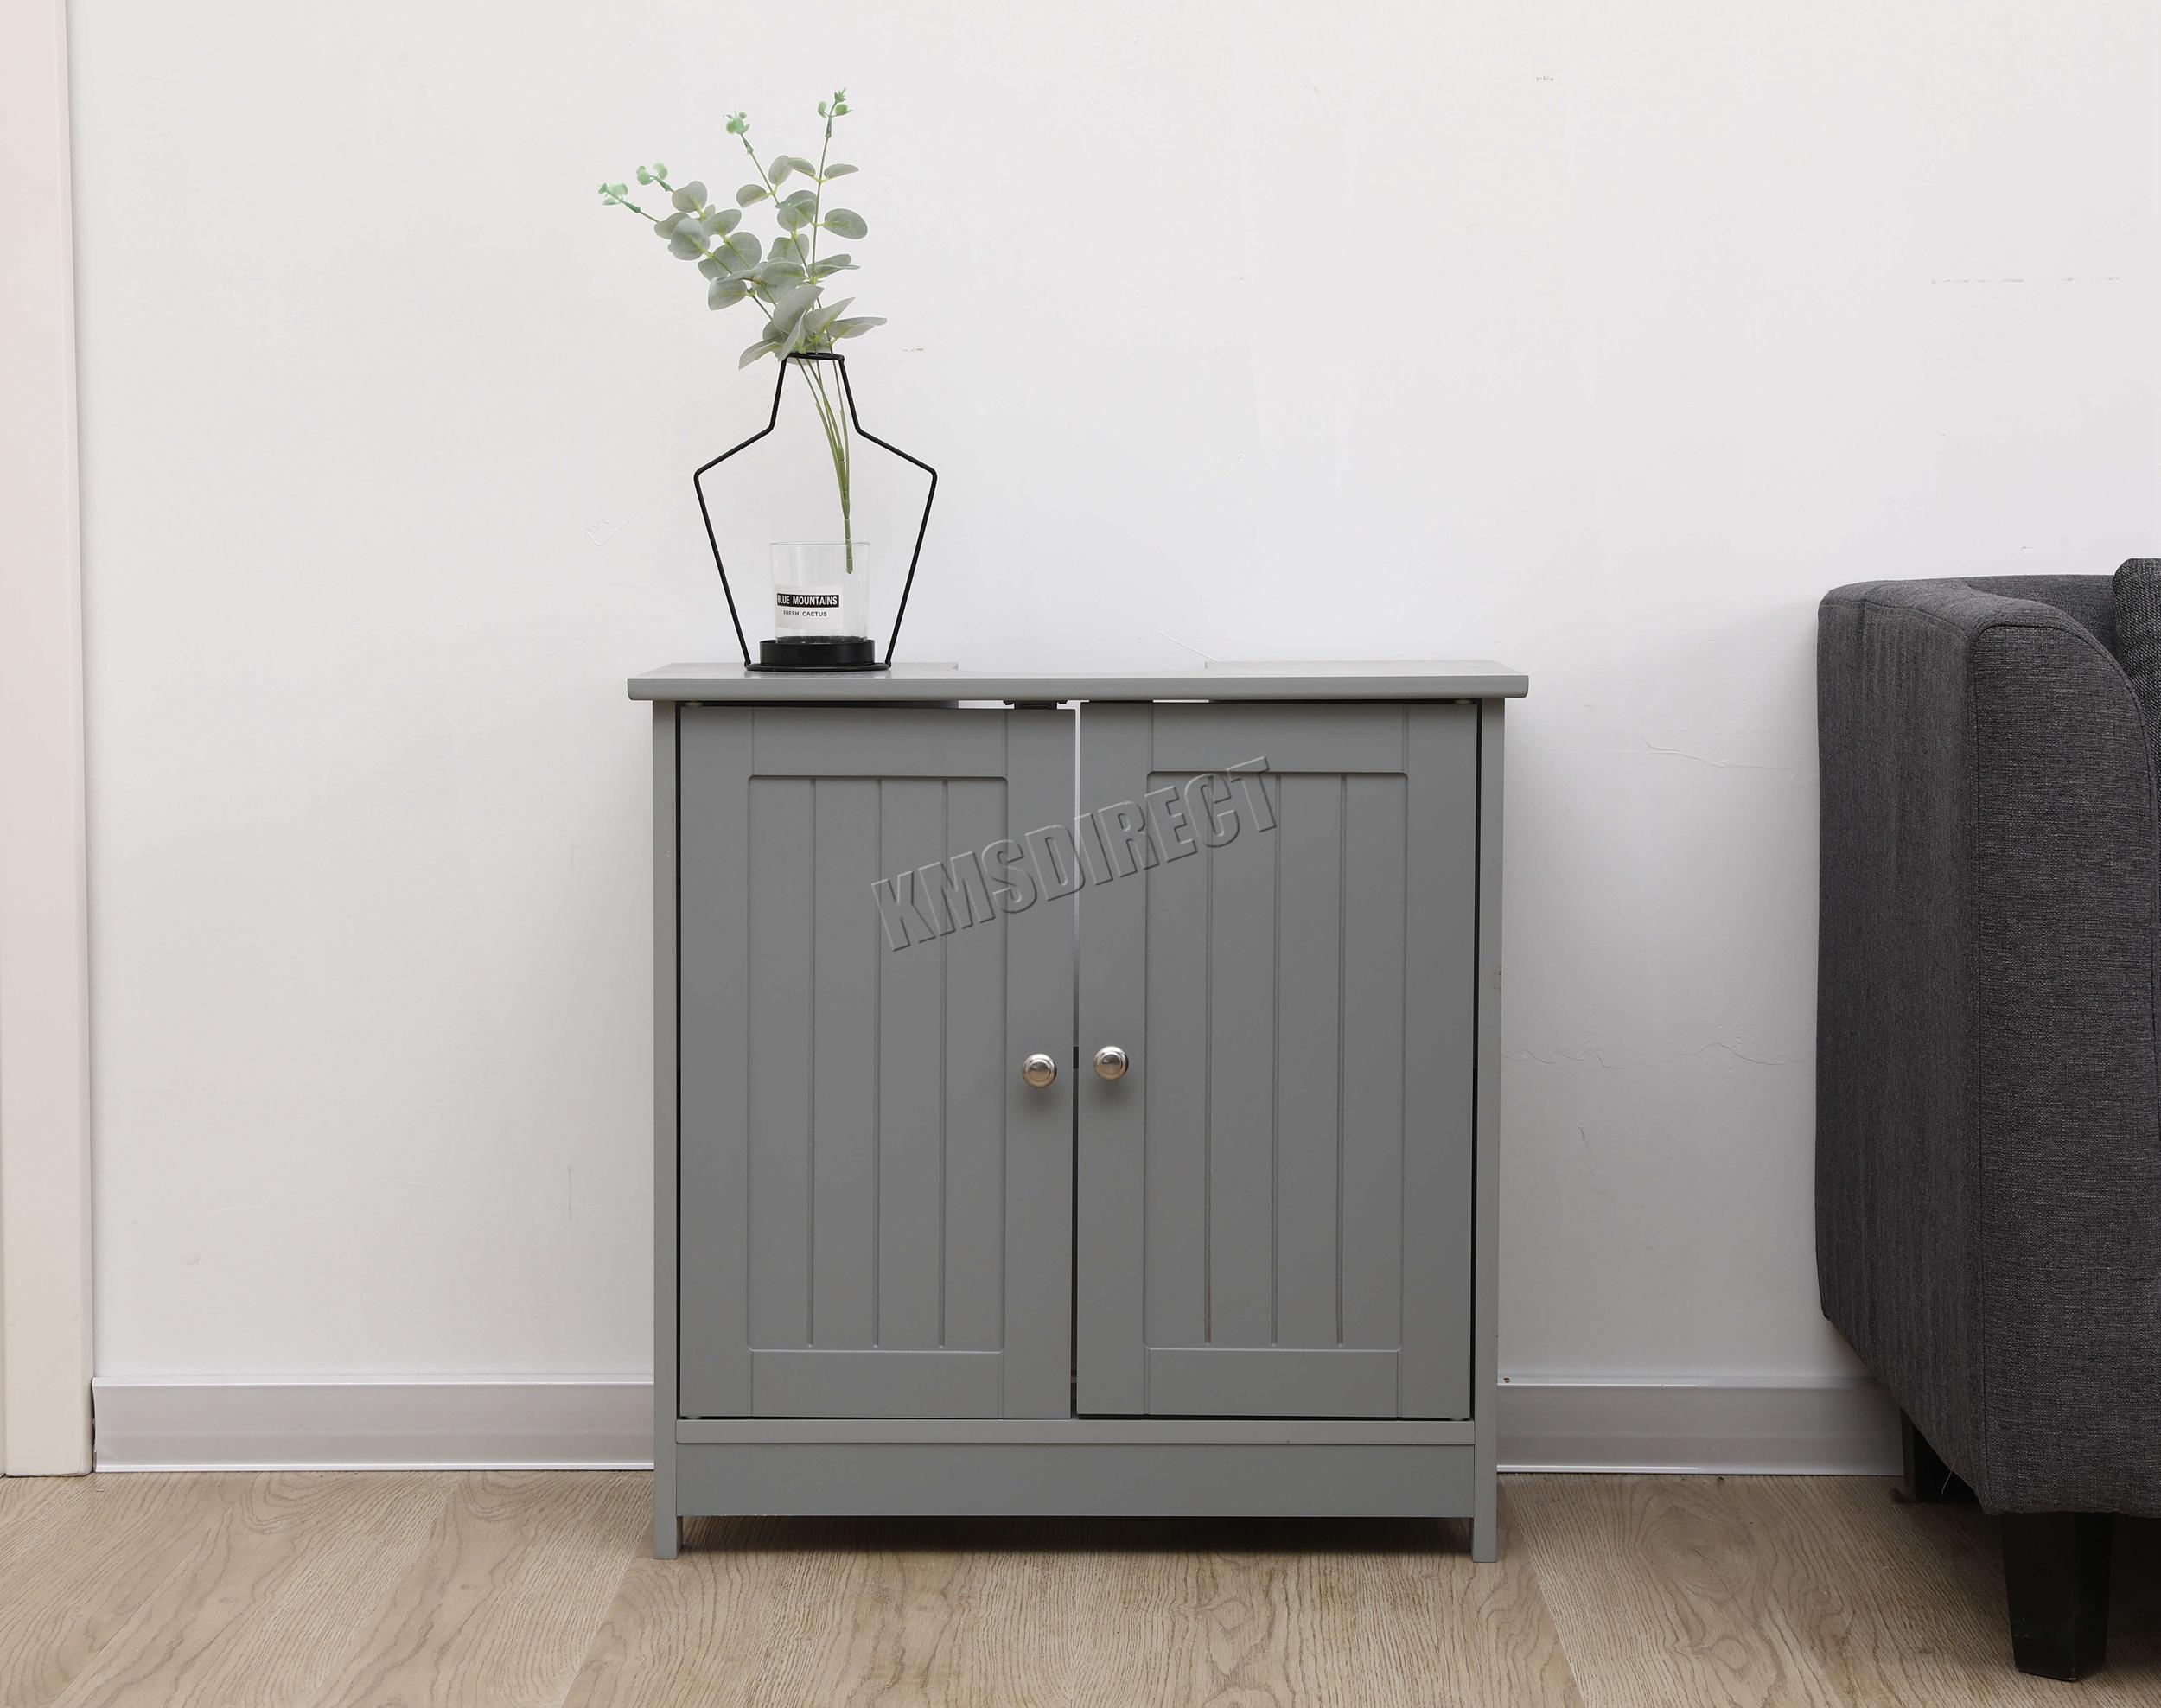 WestWood-Vanity-Unit-Wooden-Under-Sink-Wash-Basin-Bathroom-Cabinet-Storage thumbnail 14